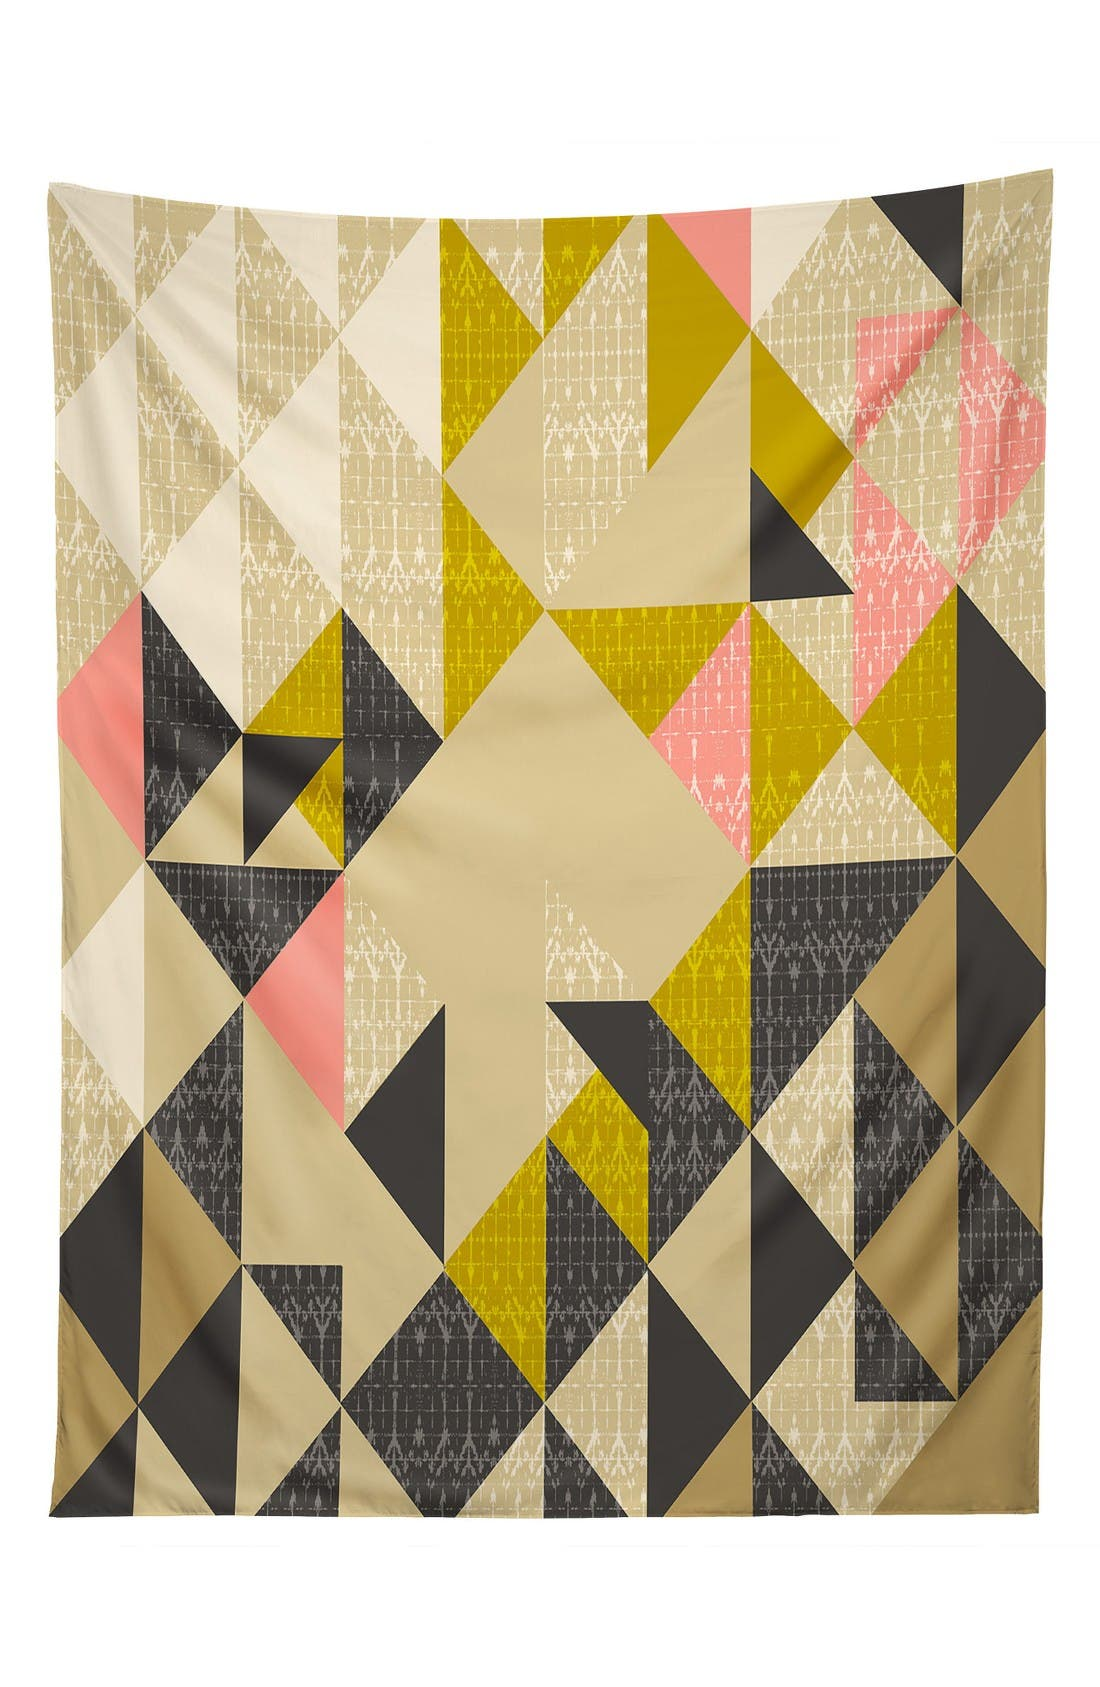 DENY Designs Nomad Quilt Tapestry